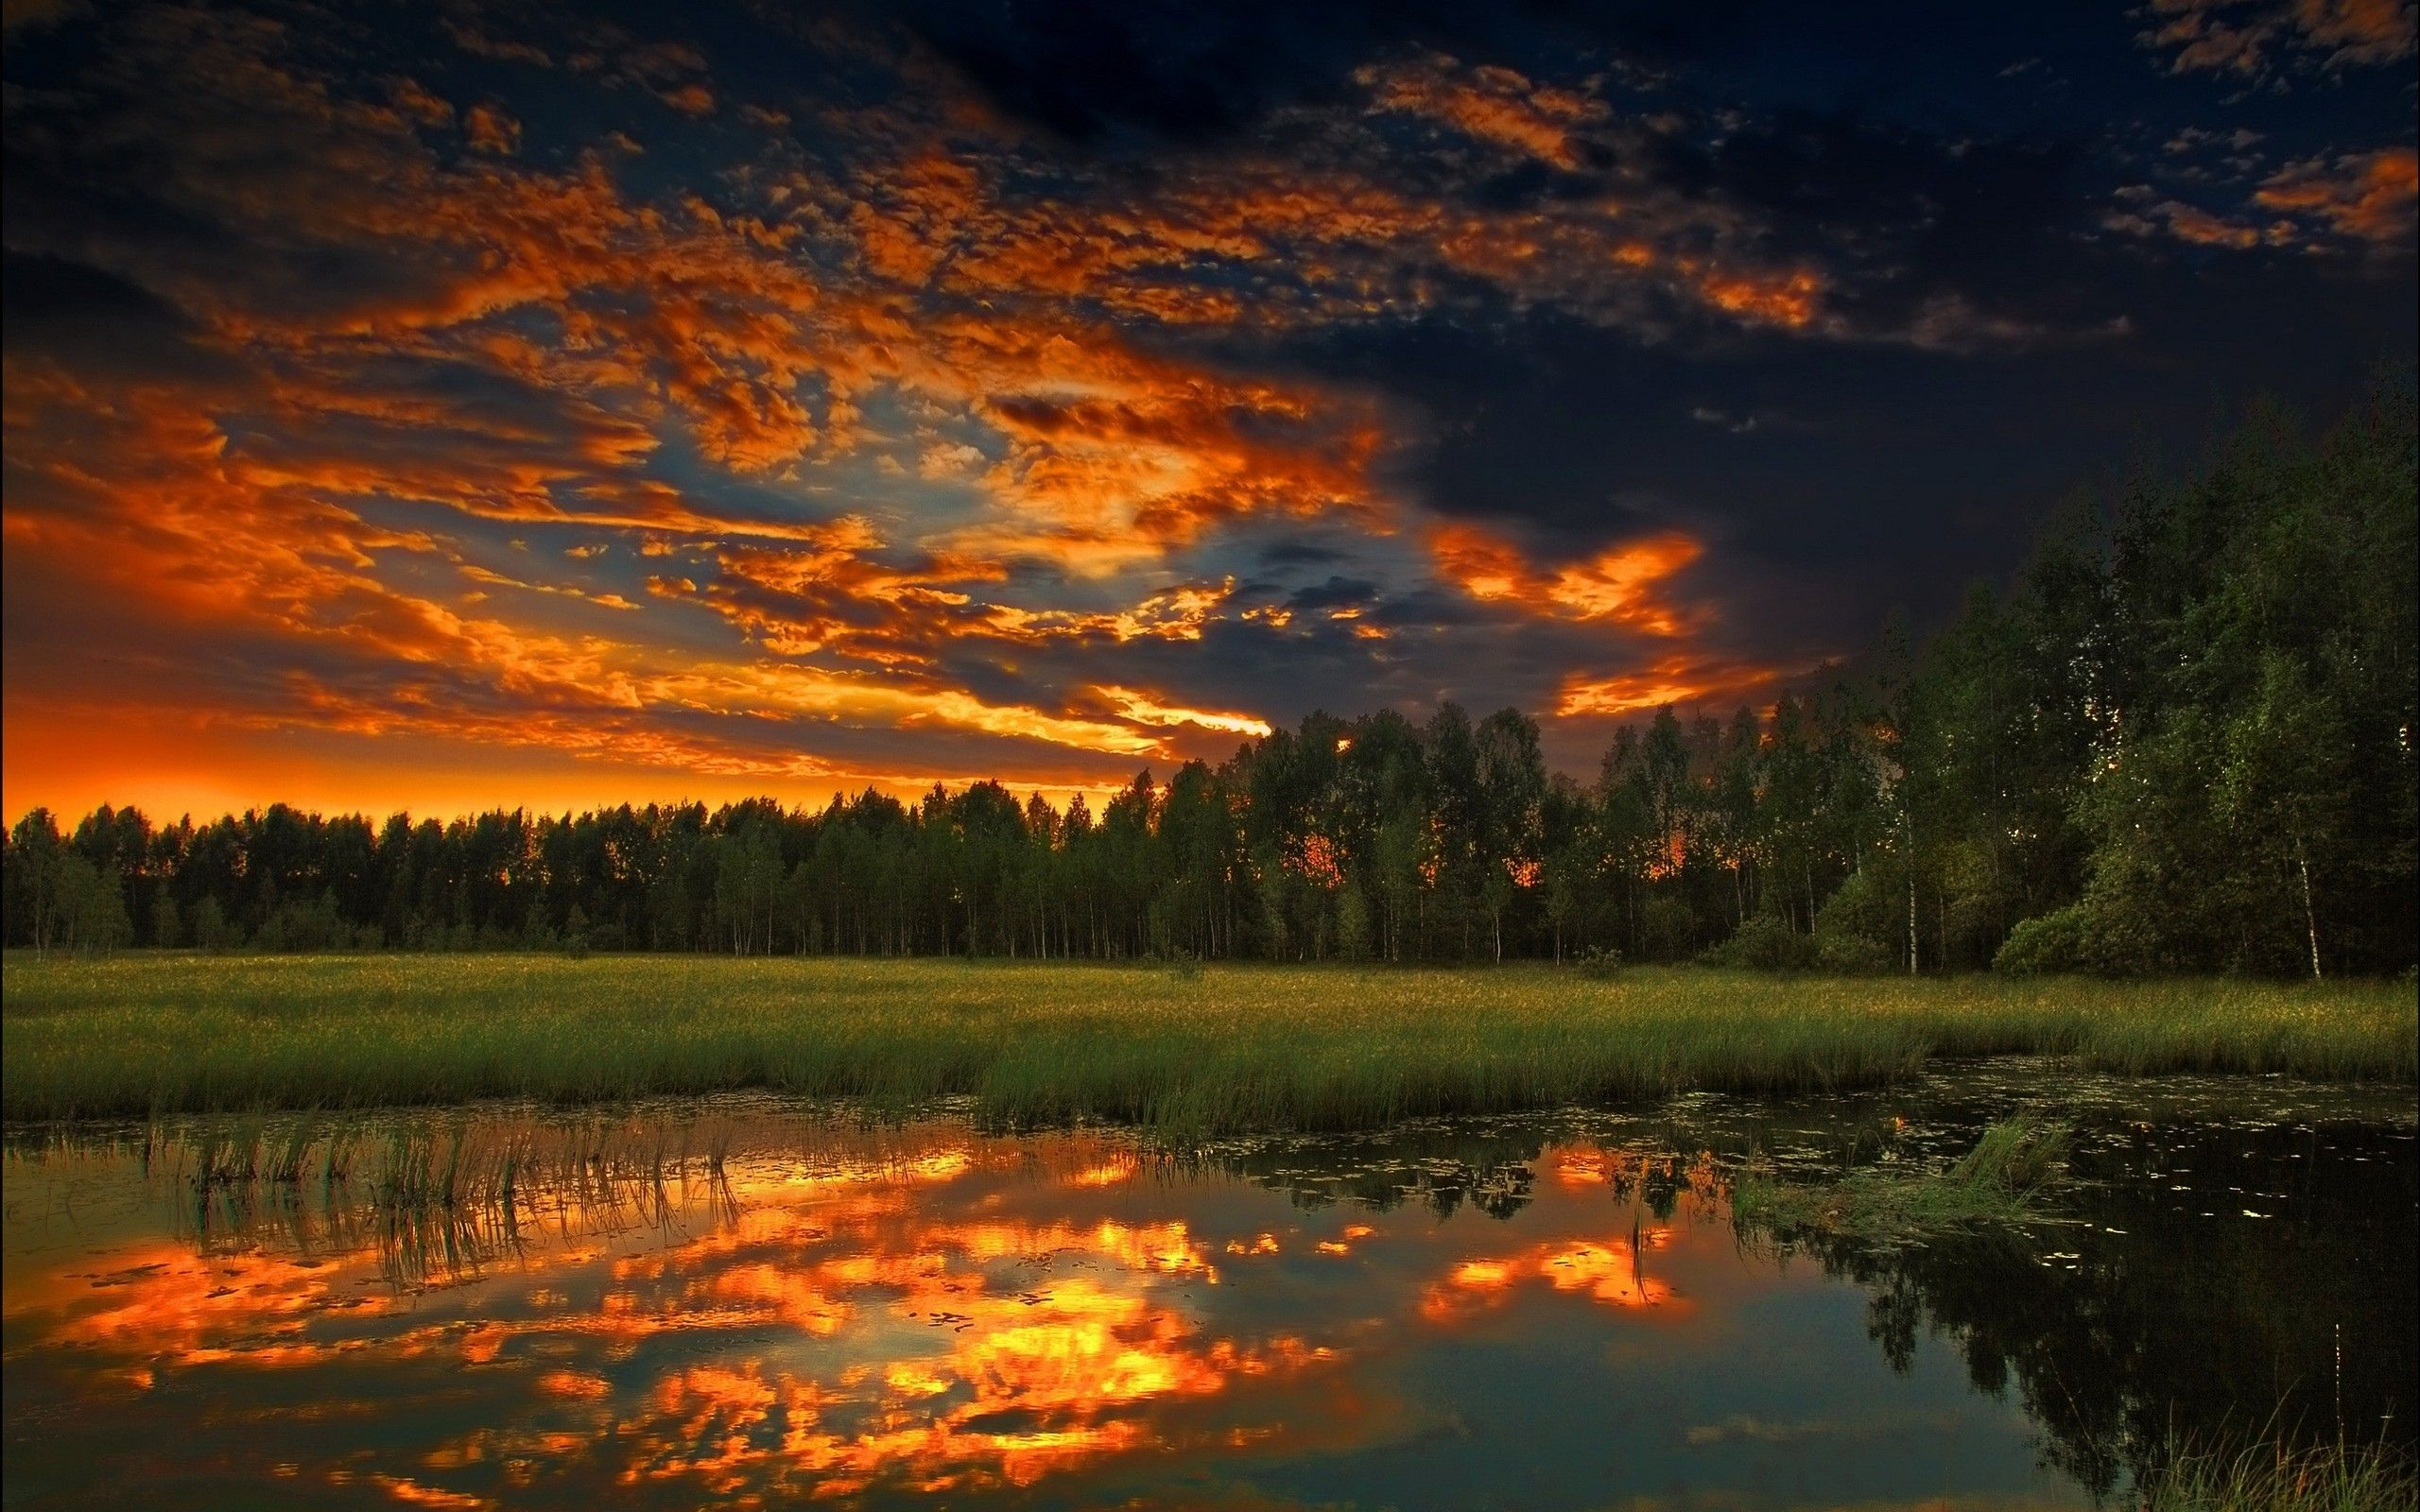 Sunset Night Sky Sunset Clouds Landscapes Nature Forest Lakes Night Sky 2560 1600 Hd Sunset Landscape Forest Sunset Beautiful Sunset